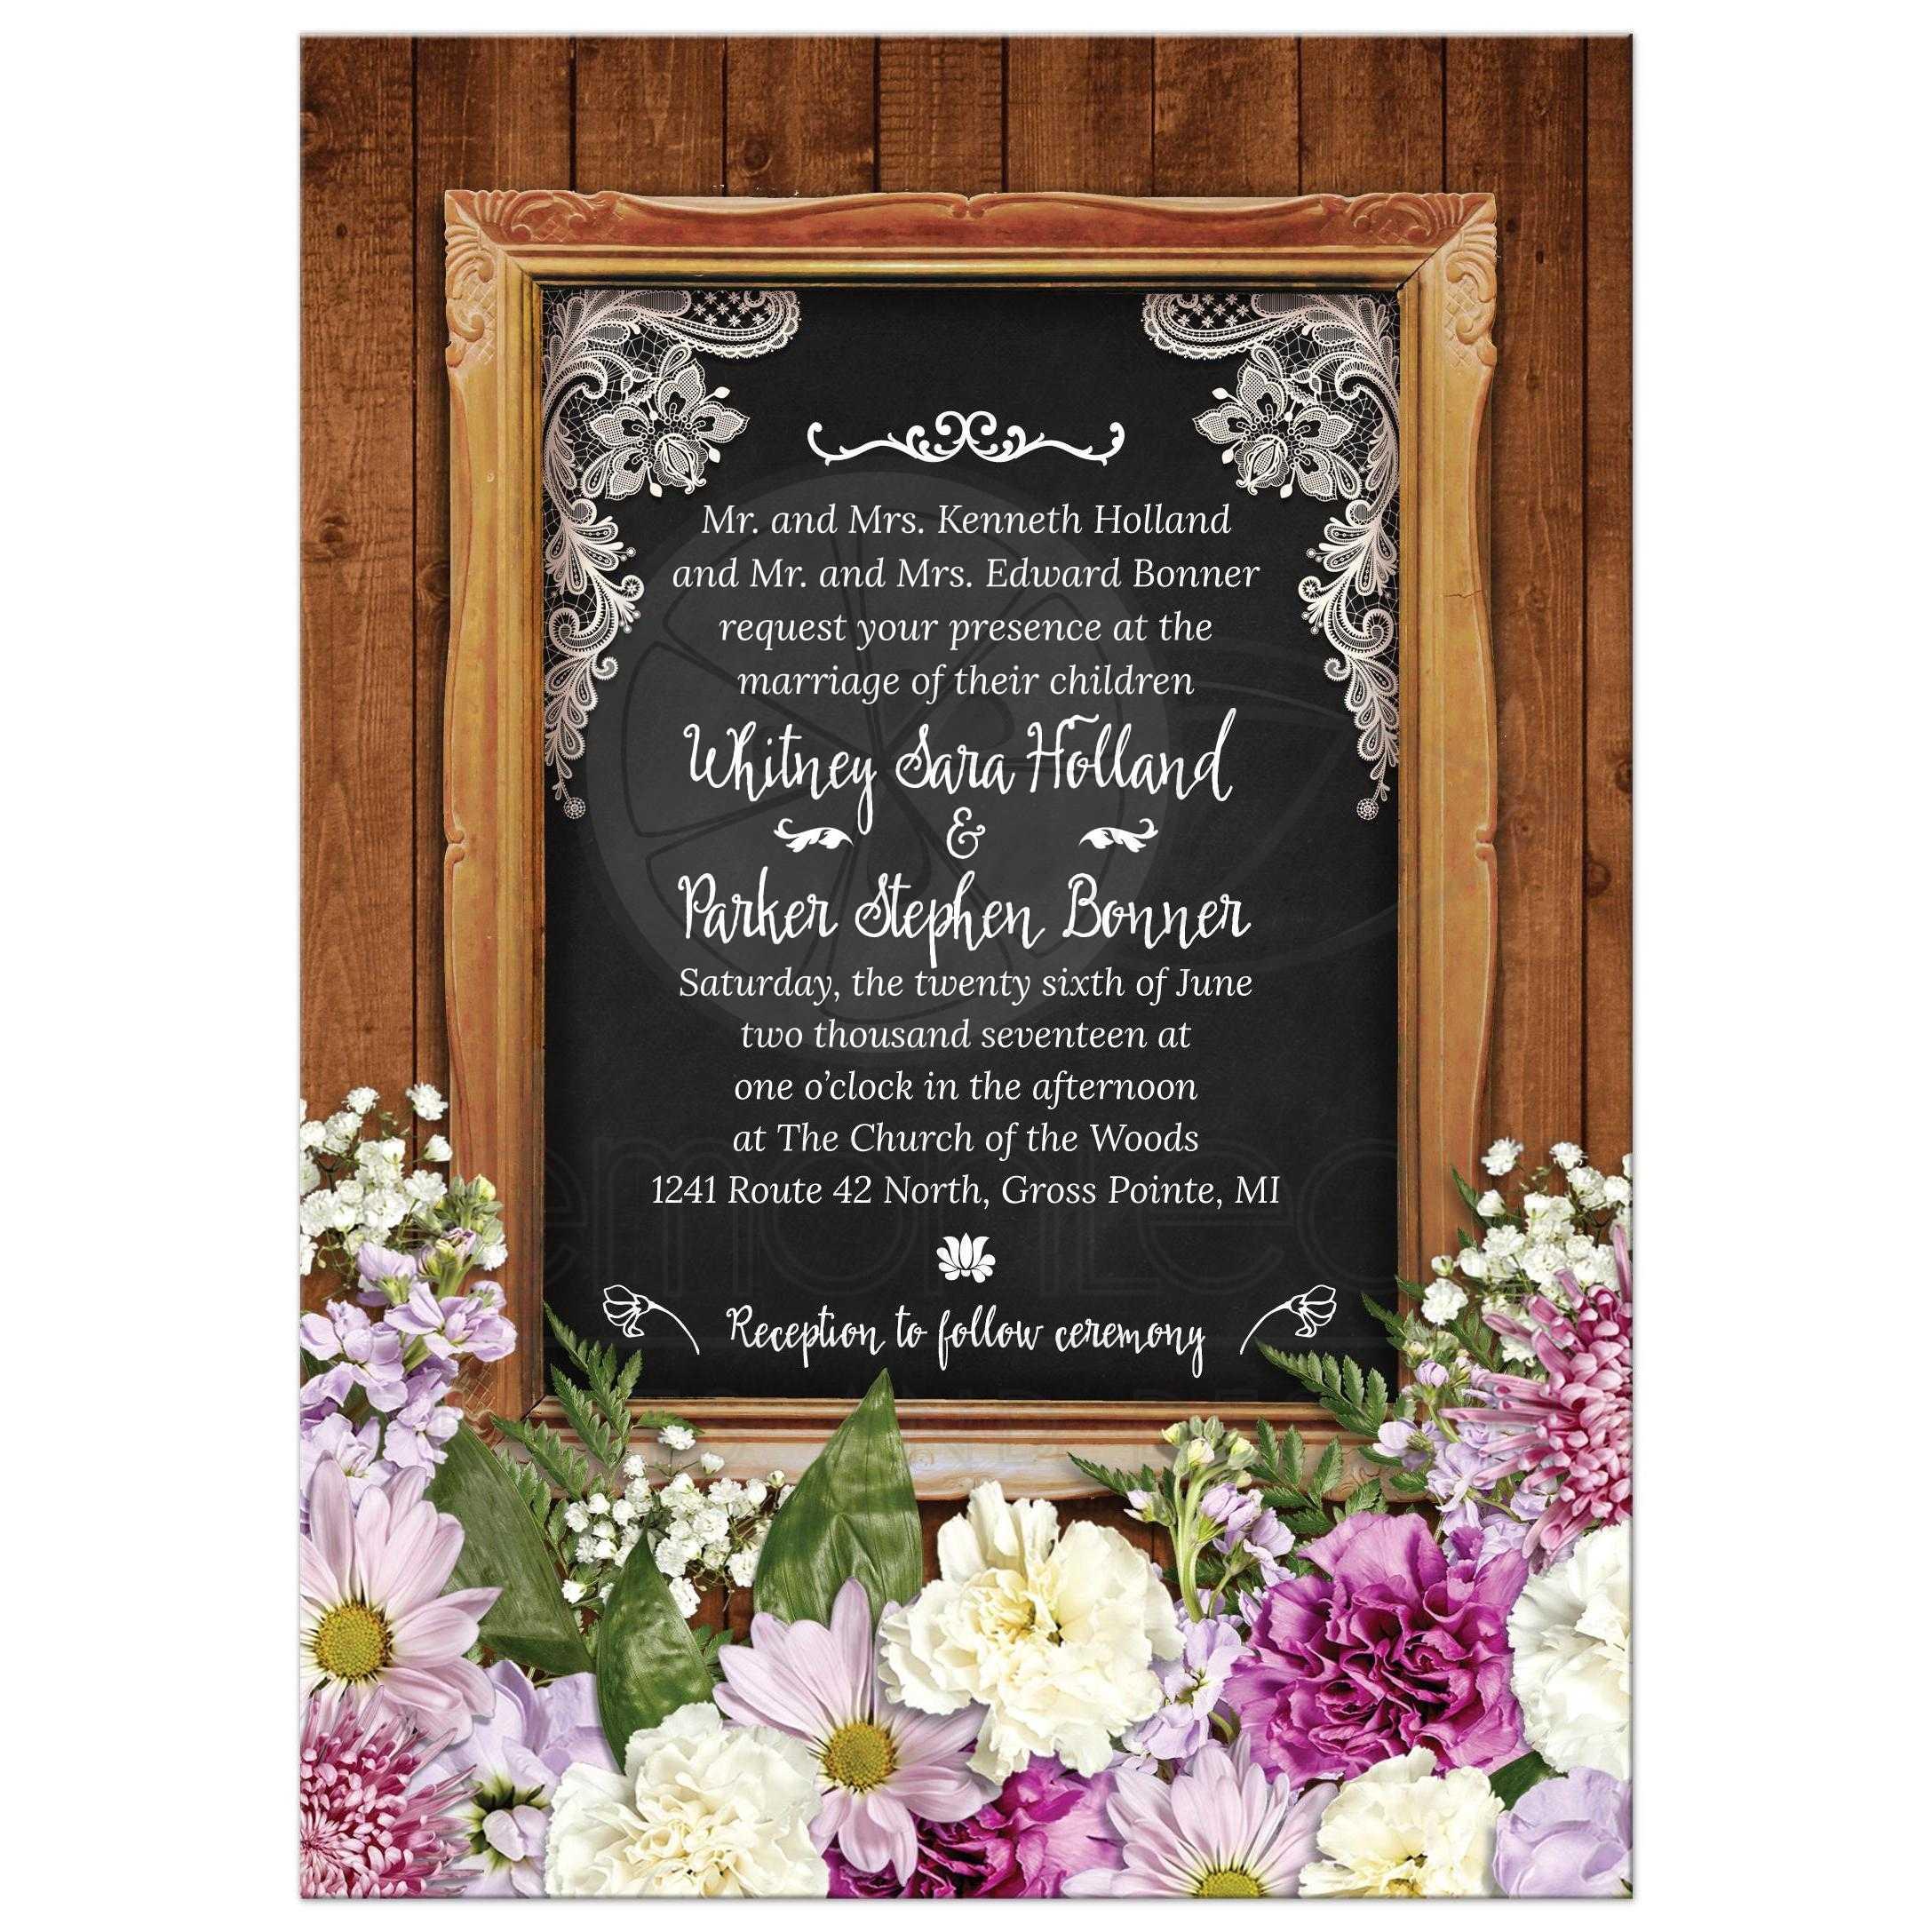 Rustic Spring Chalkboard Picture Frame Floral Wedding